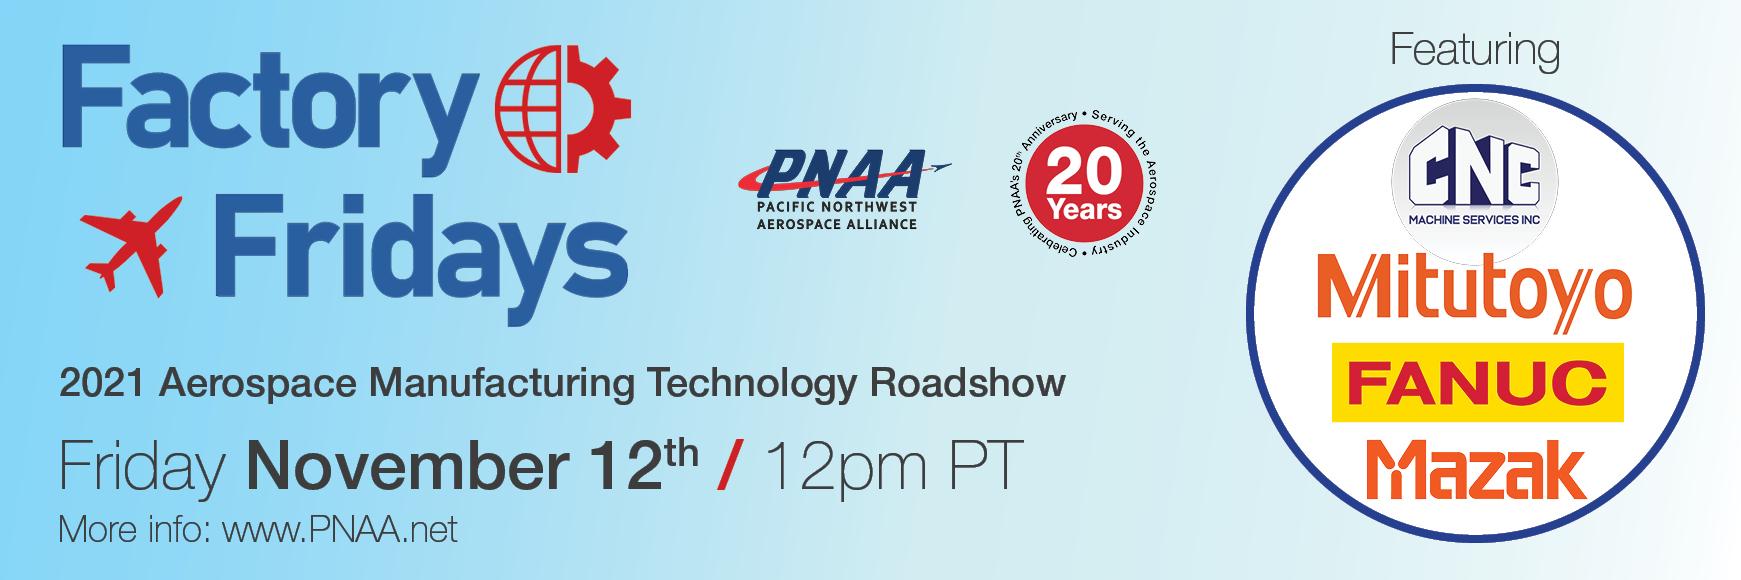 PNAA_FF_Aero_Mfg_Technology_Roadshow